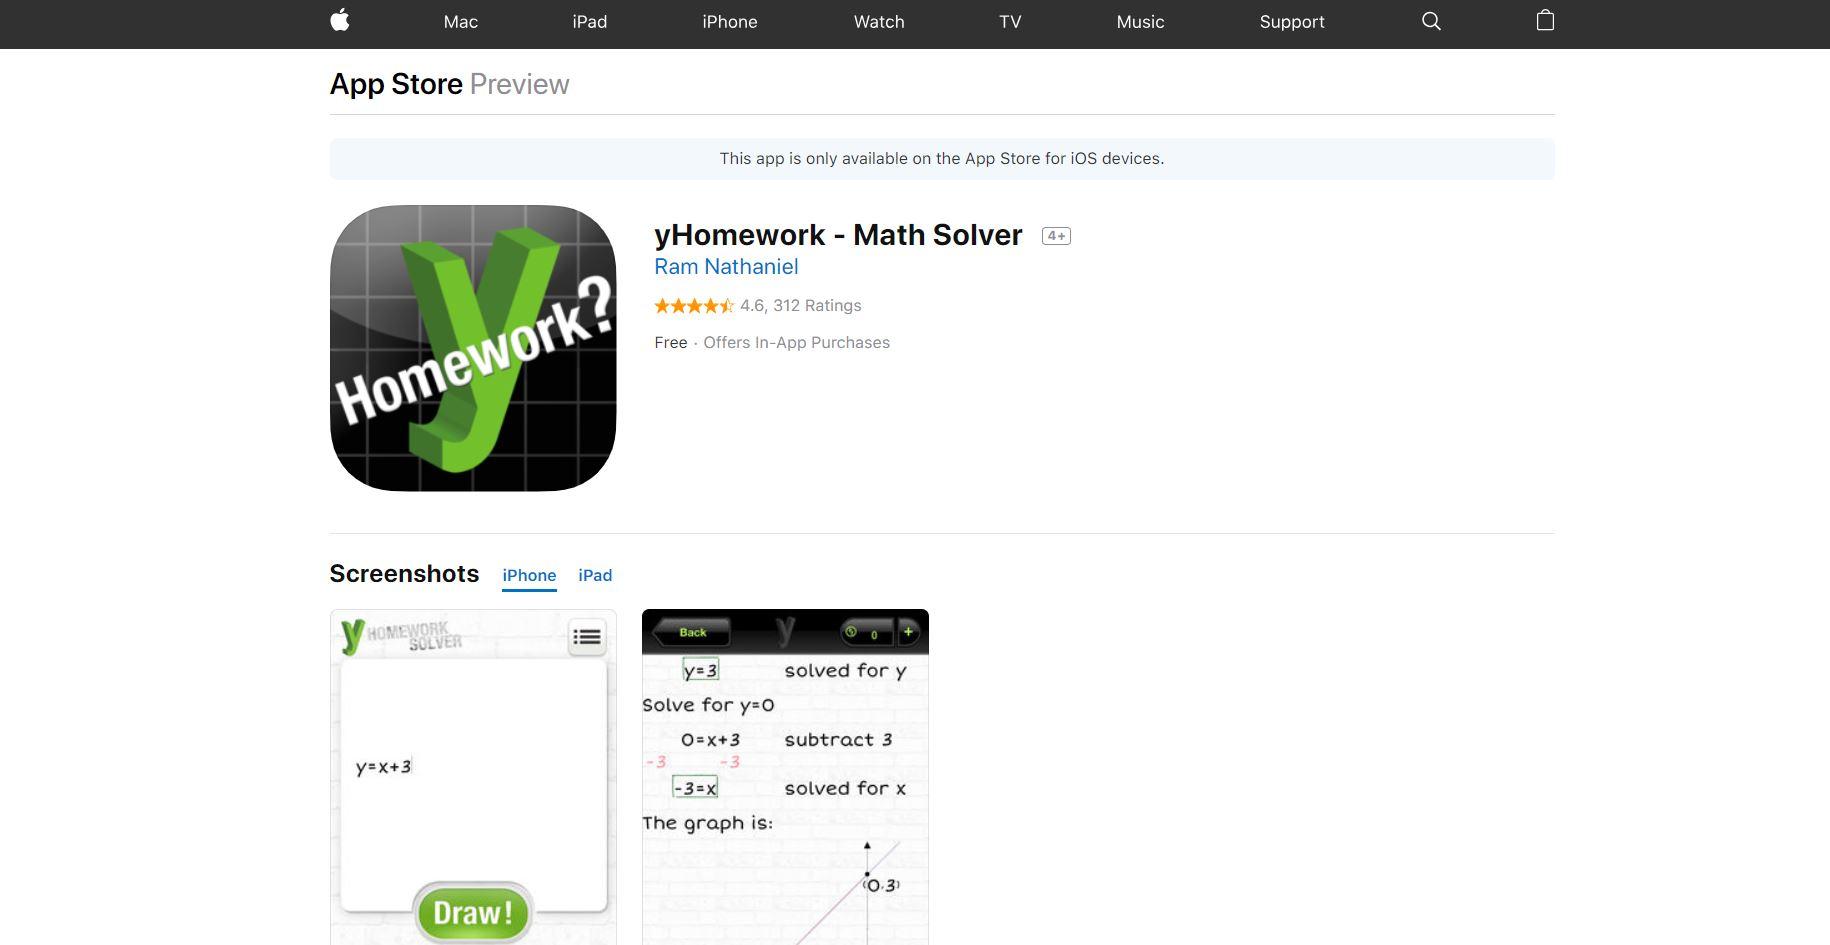 yHomework - Math Solver CodaKid Top 21 Math Apps of 2019